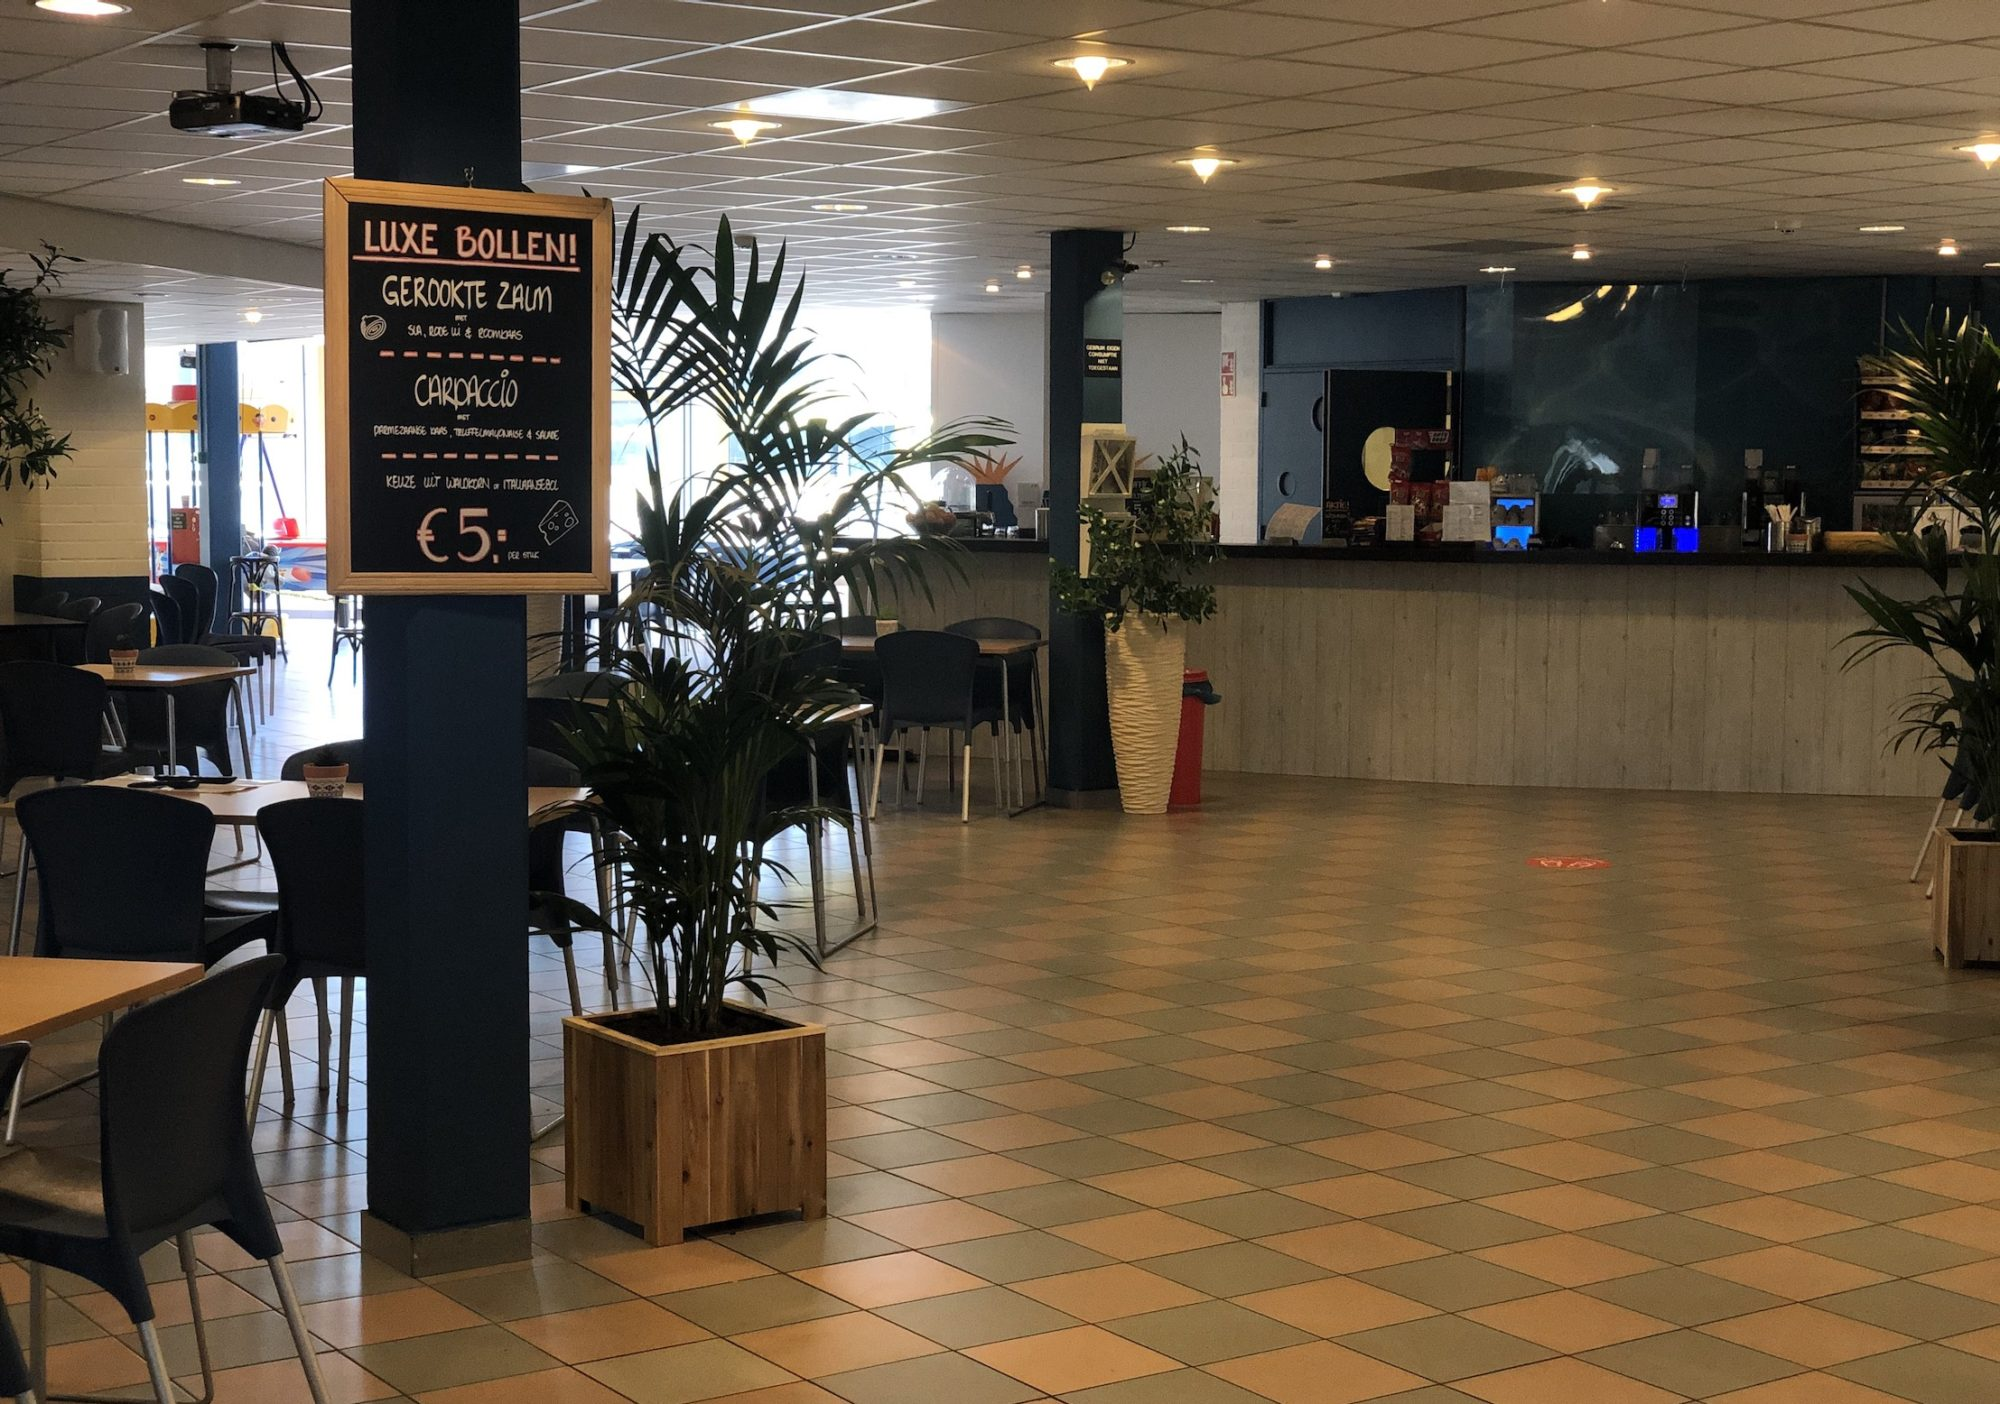 Sportcafé De Meerkamp